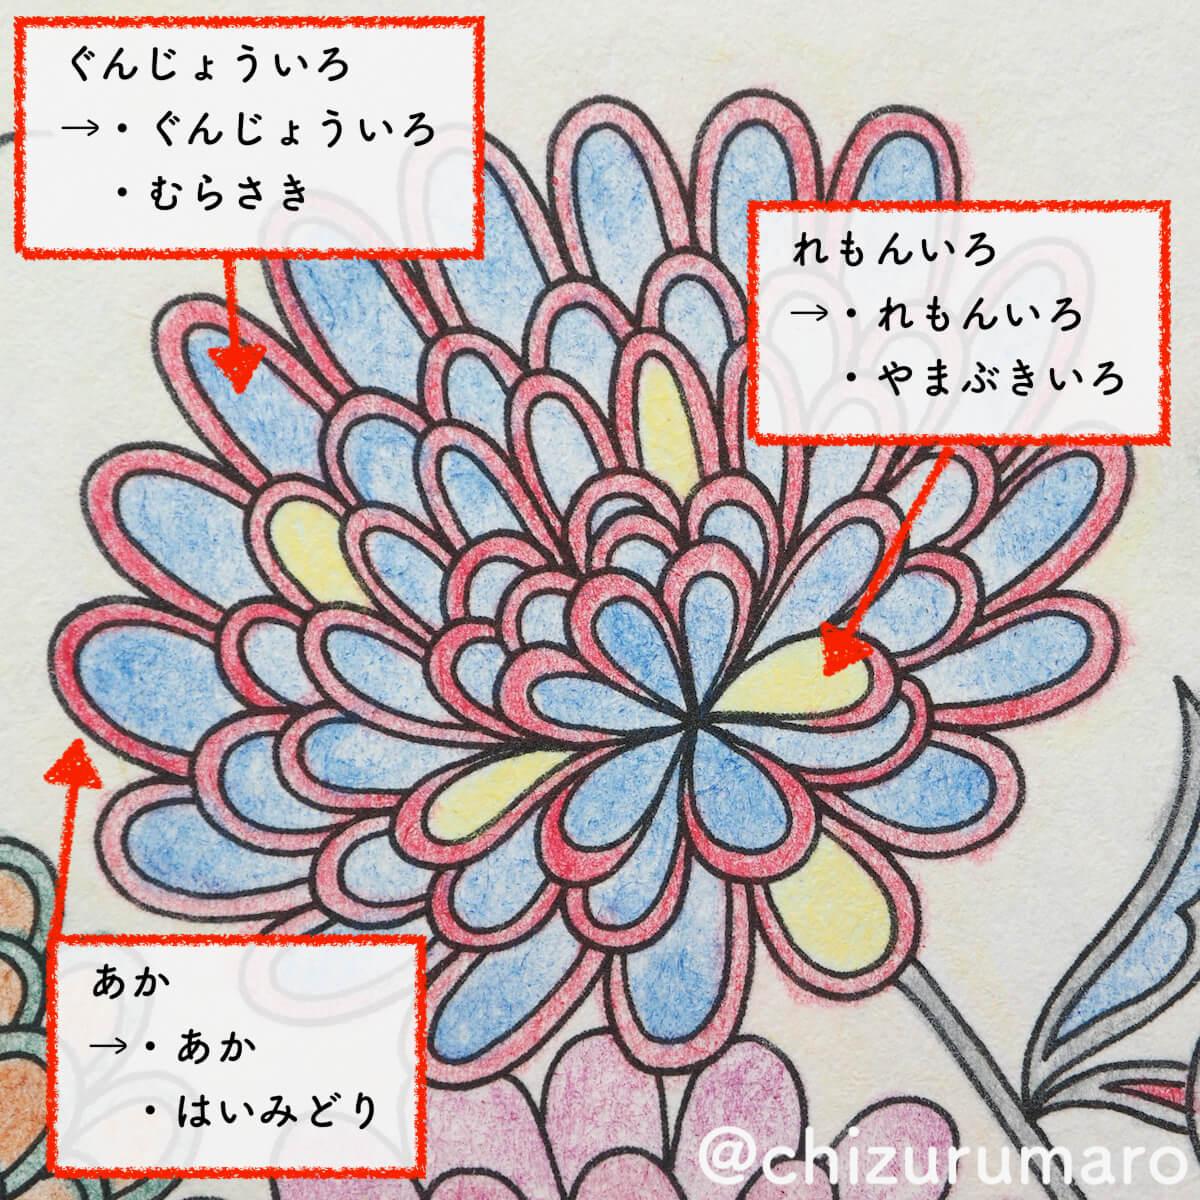 f:id:chizurumaro:20200404105403j:plain